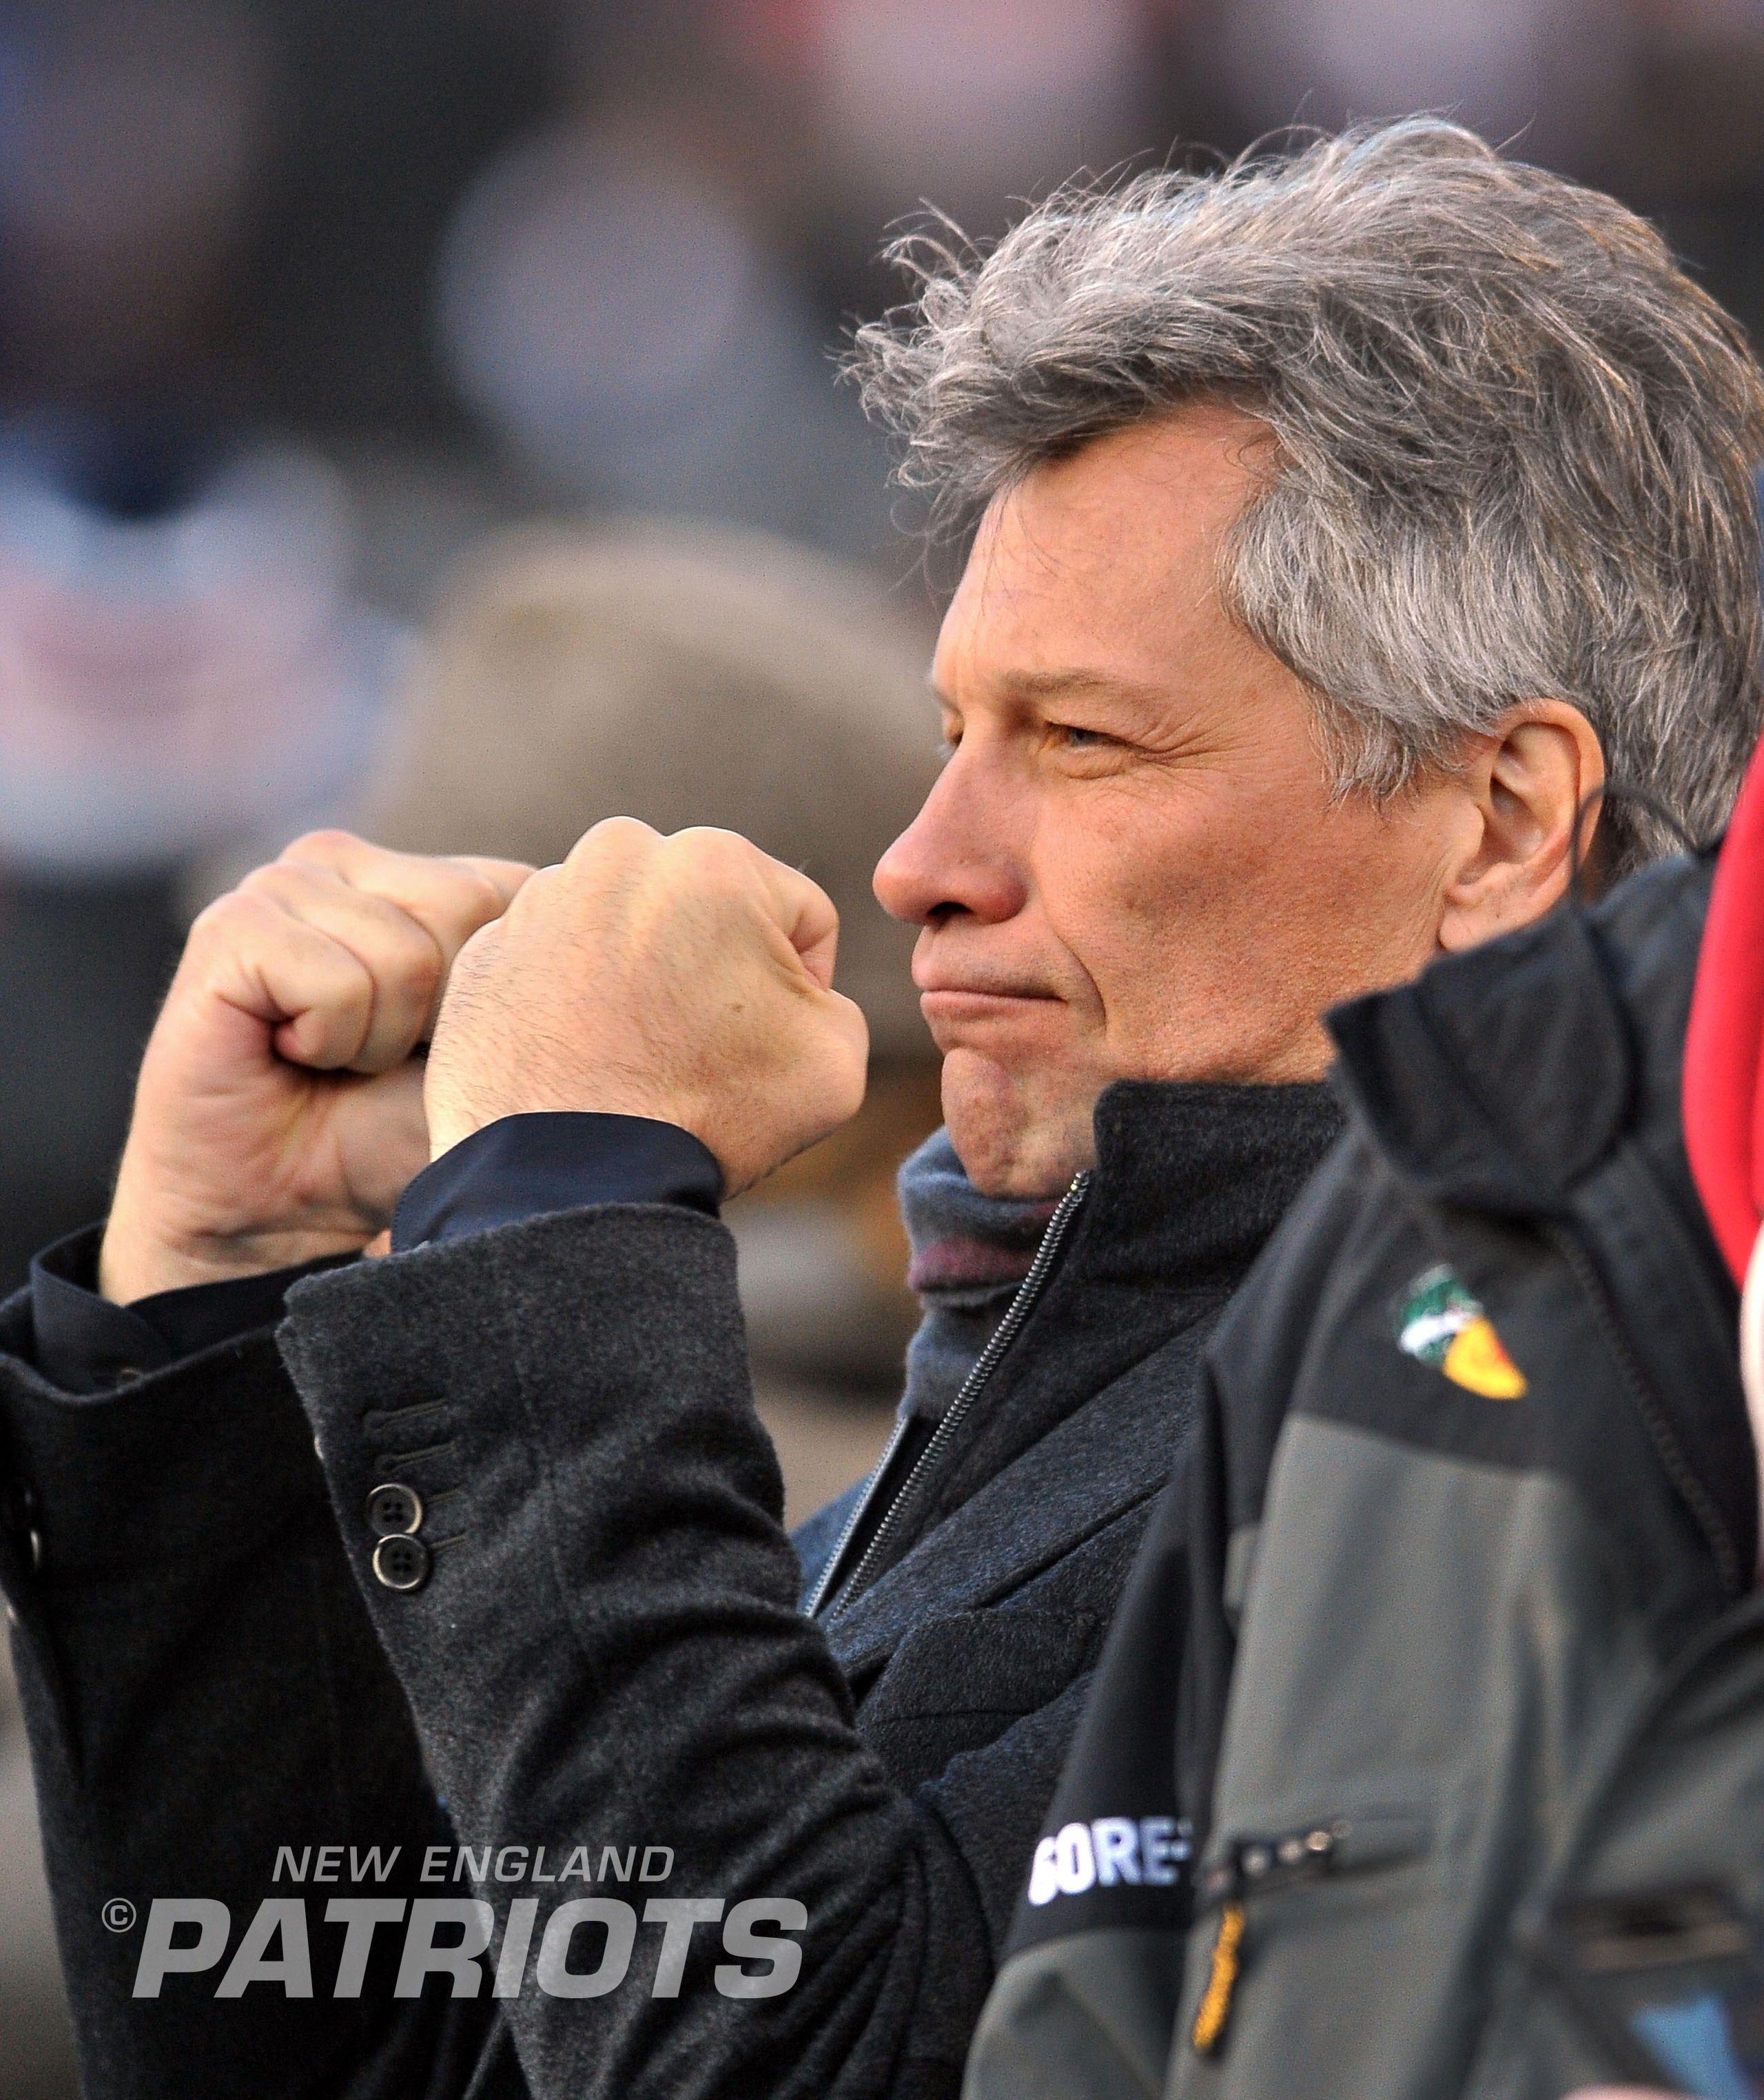 Nordstrom's Best and Brightest presented by CarMax: Patriots - Chiefs 1/16 | Jon Bon Jovi | Bon ...